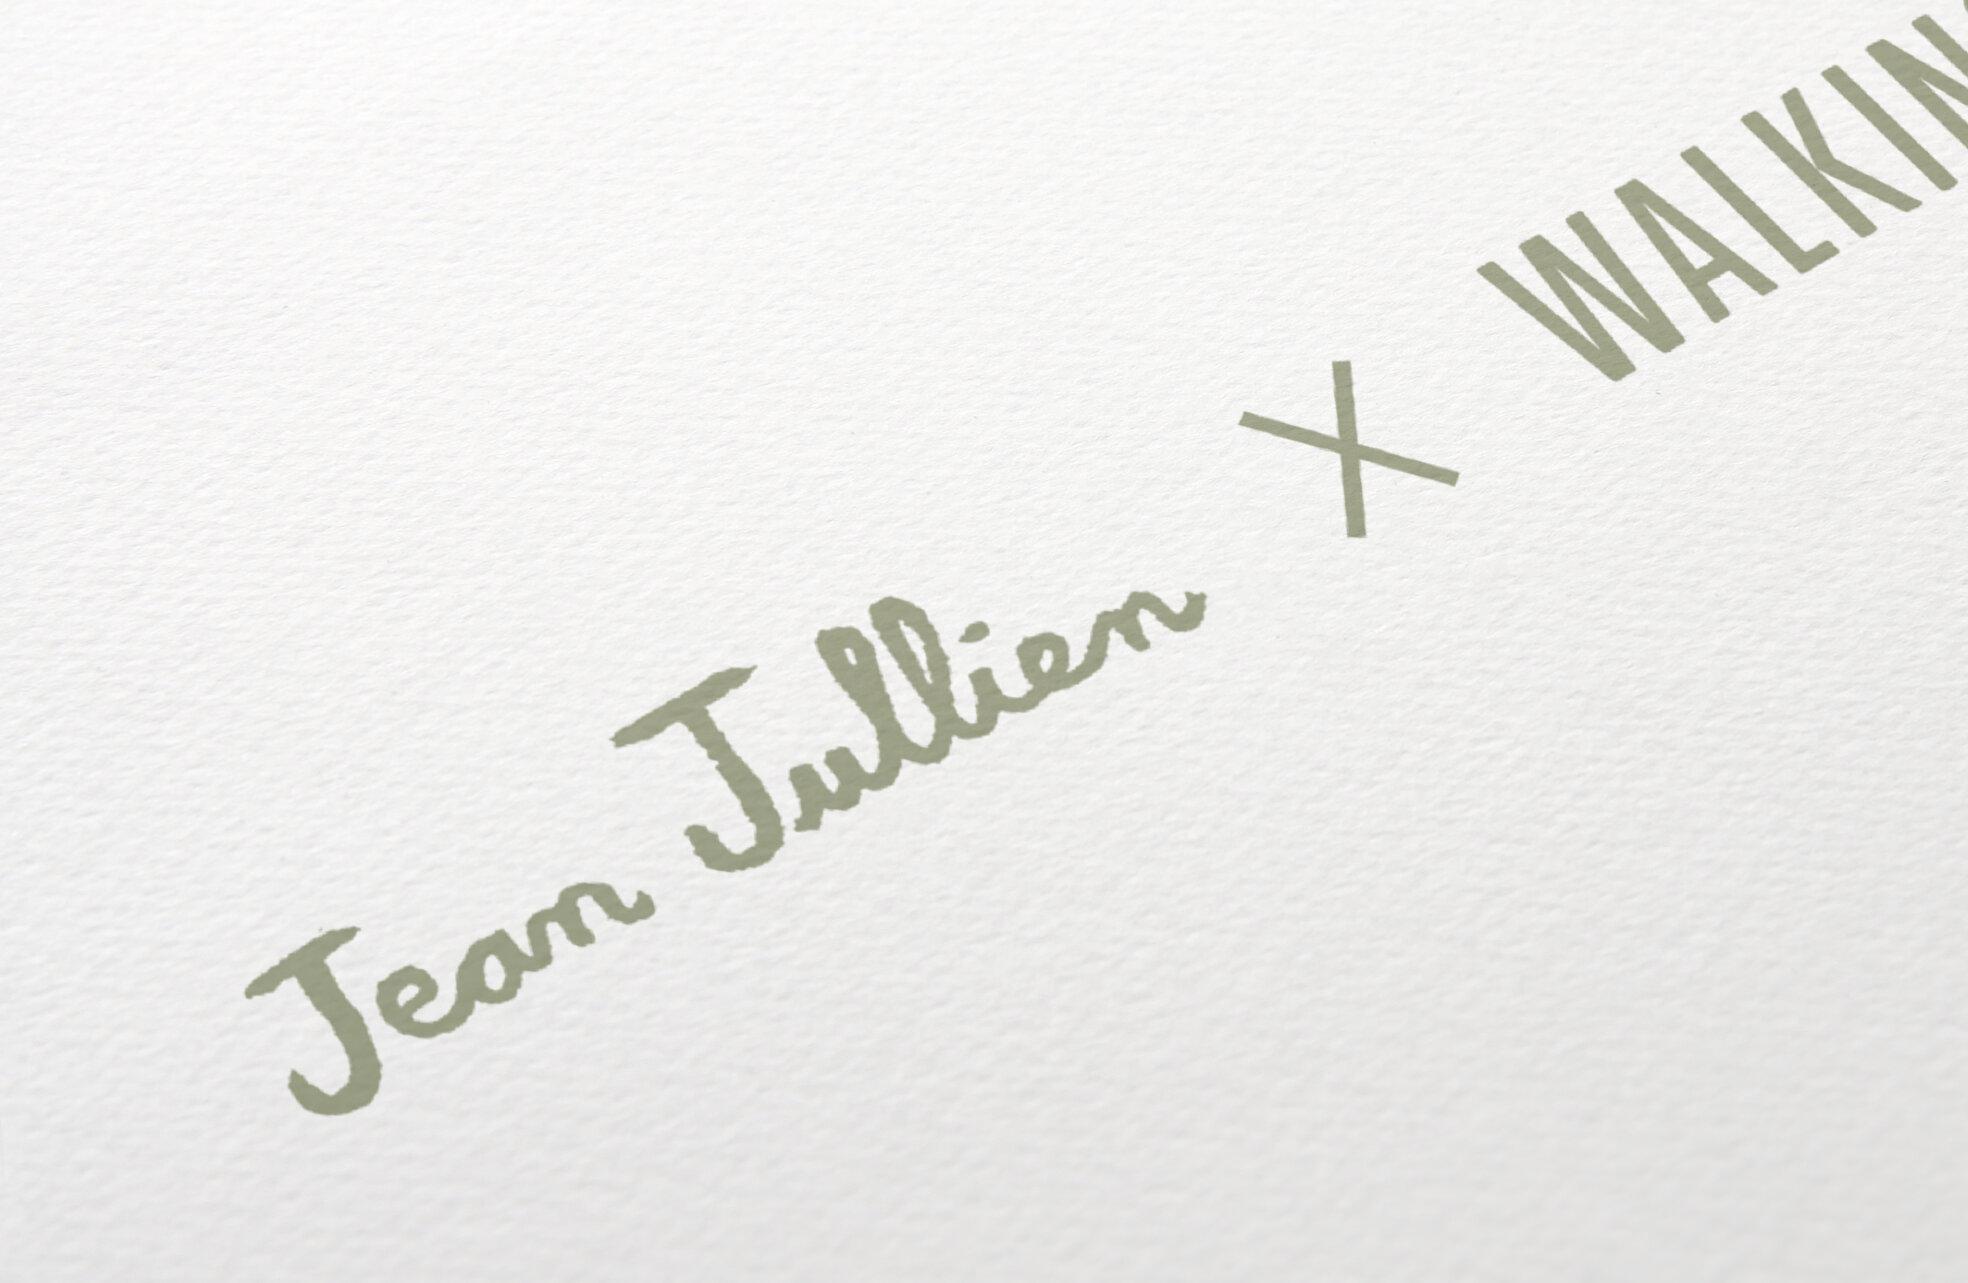 Poster_Jean_Jullien_Walking_Wild_Details.jpg